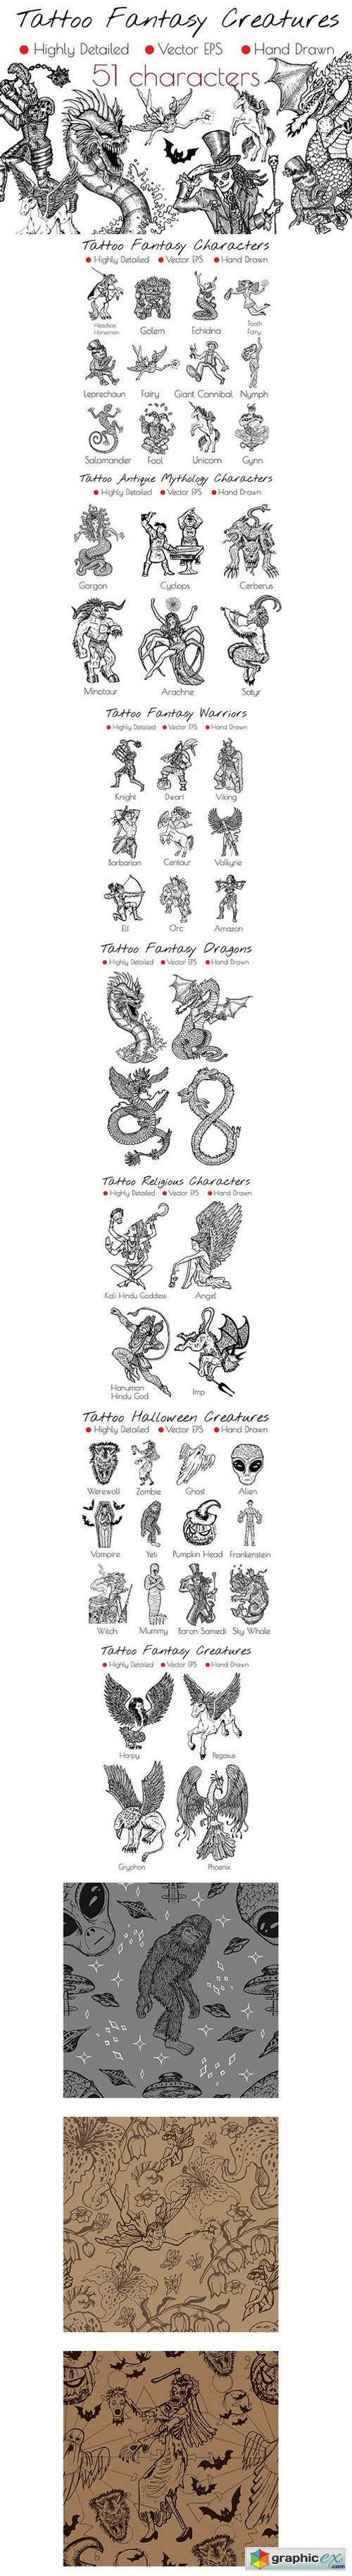 Tattoo Fantasy Characters